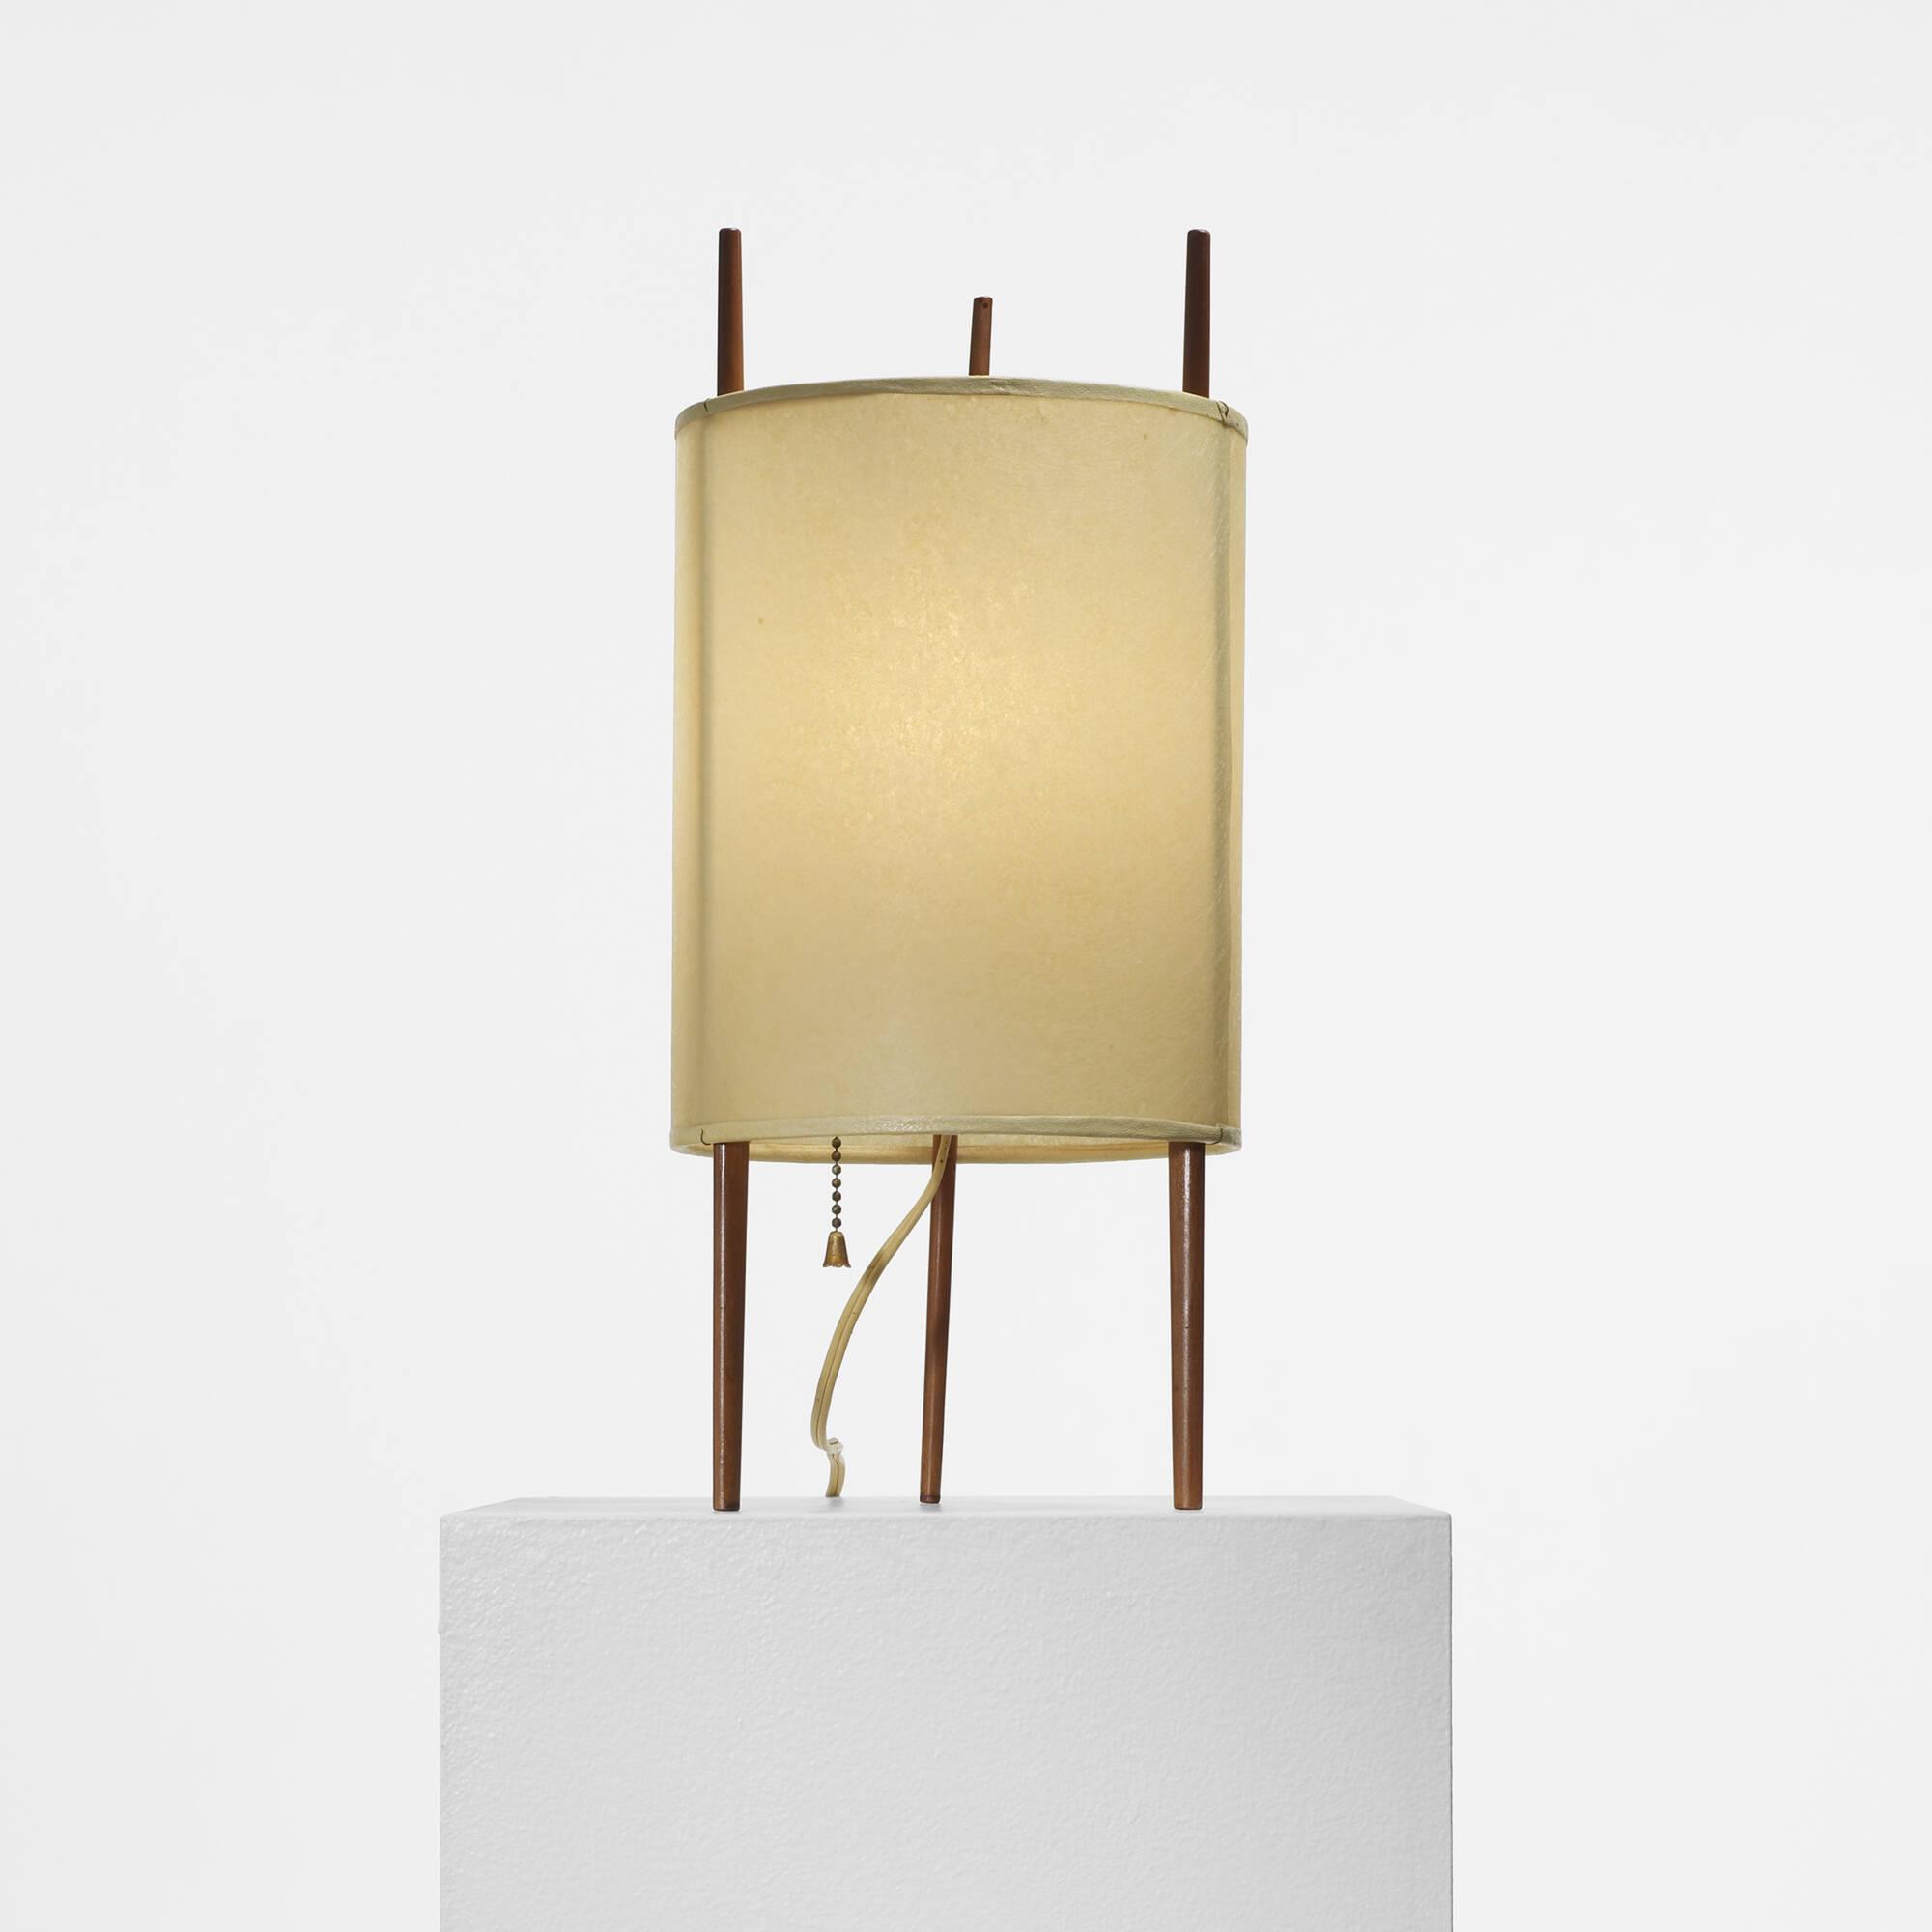 318: ISAMU NOGUCHI, table lamp